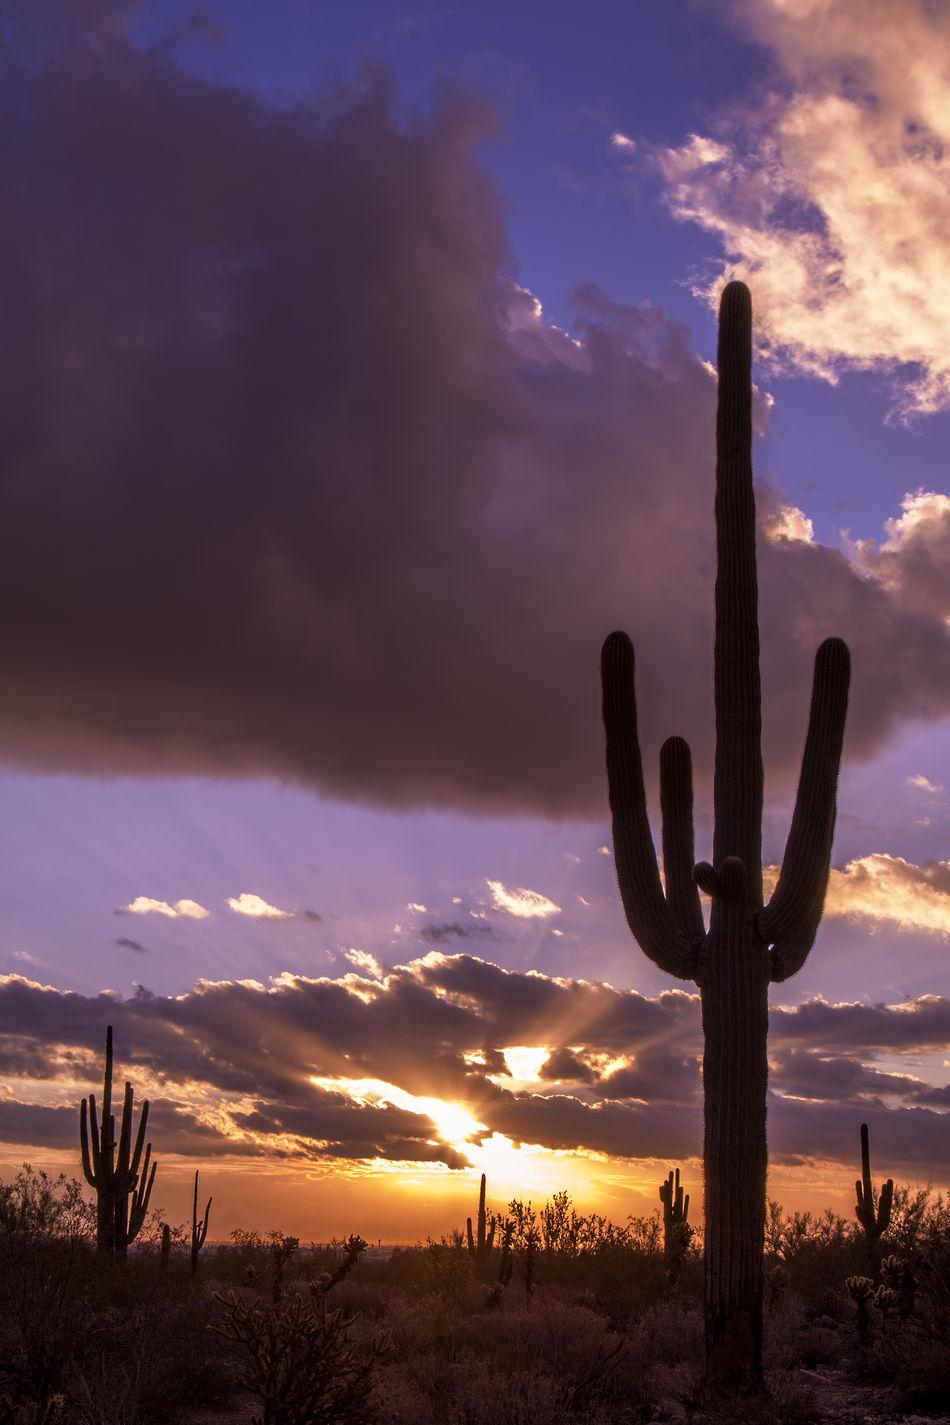 Saguaro Cactus silhouetted in the sunrise. American Southwest Arizona Beautiful Cactus Desert Deserts Around The World Dramatic Landscape Jtbaskinphoto Landscape Natural Beauty Nature Pheonix  Saguaro Saguaro Cactus Sun